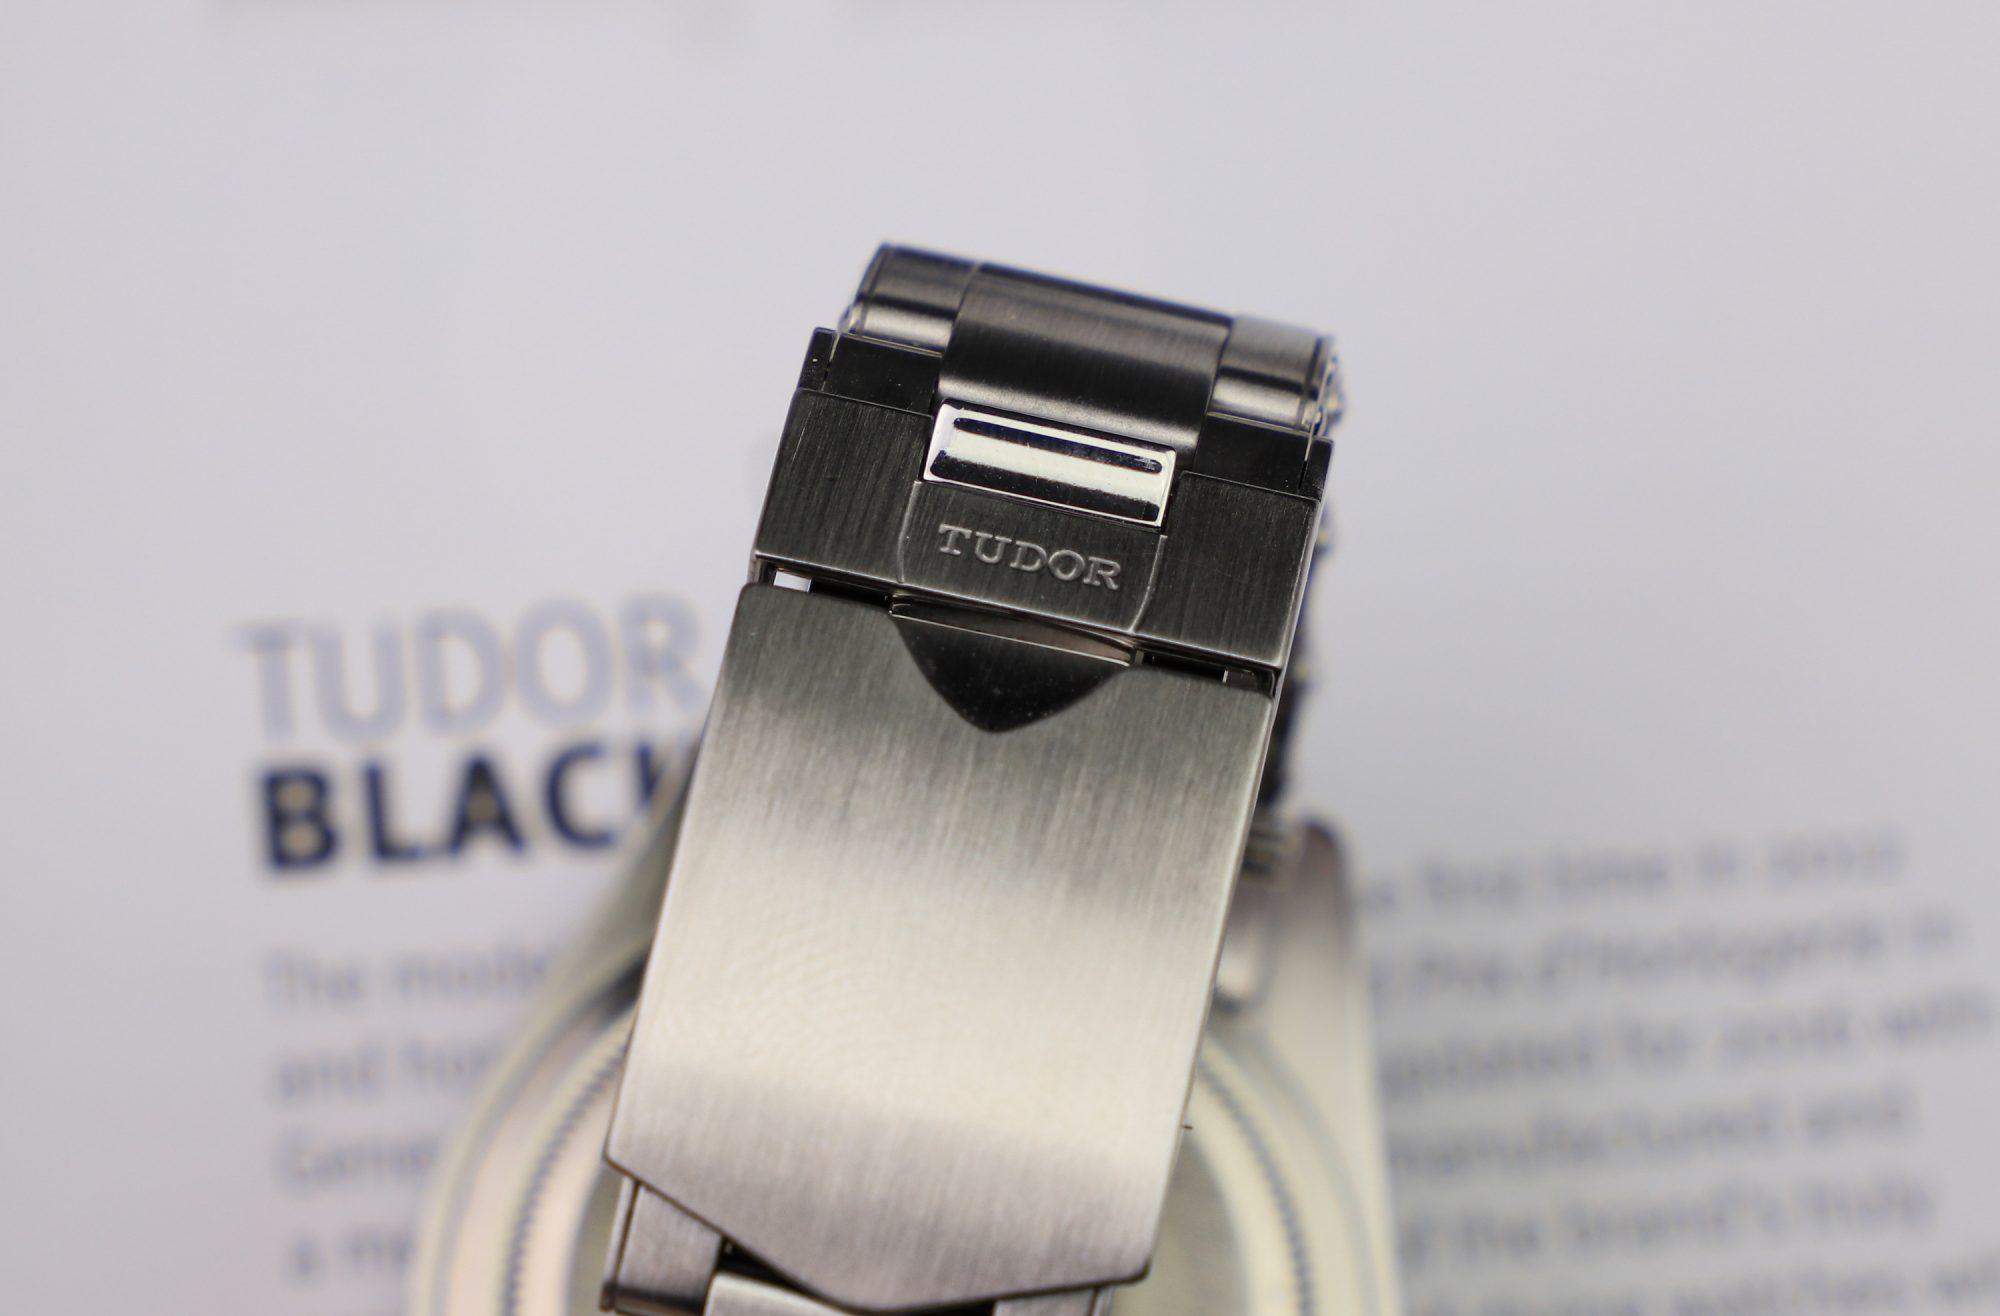 Tudor Black Bay 79230 clasp